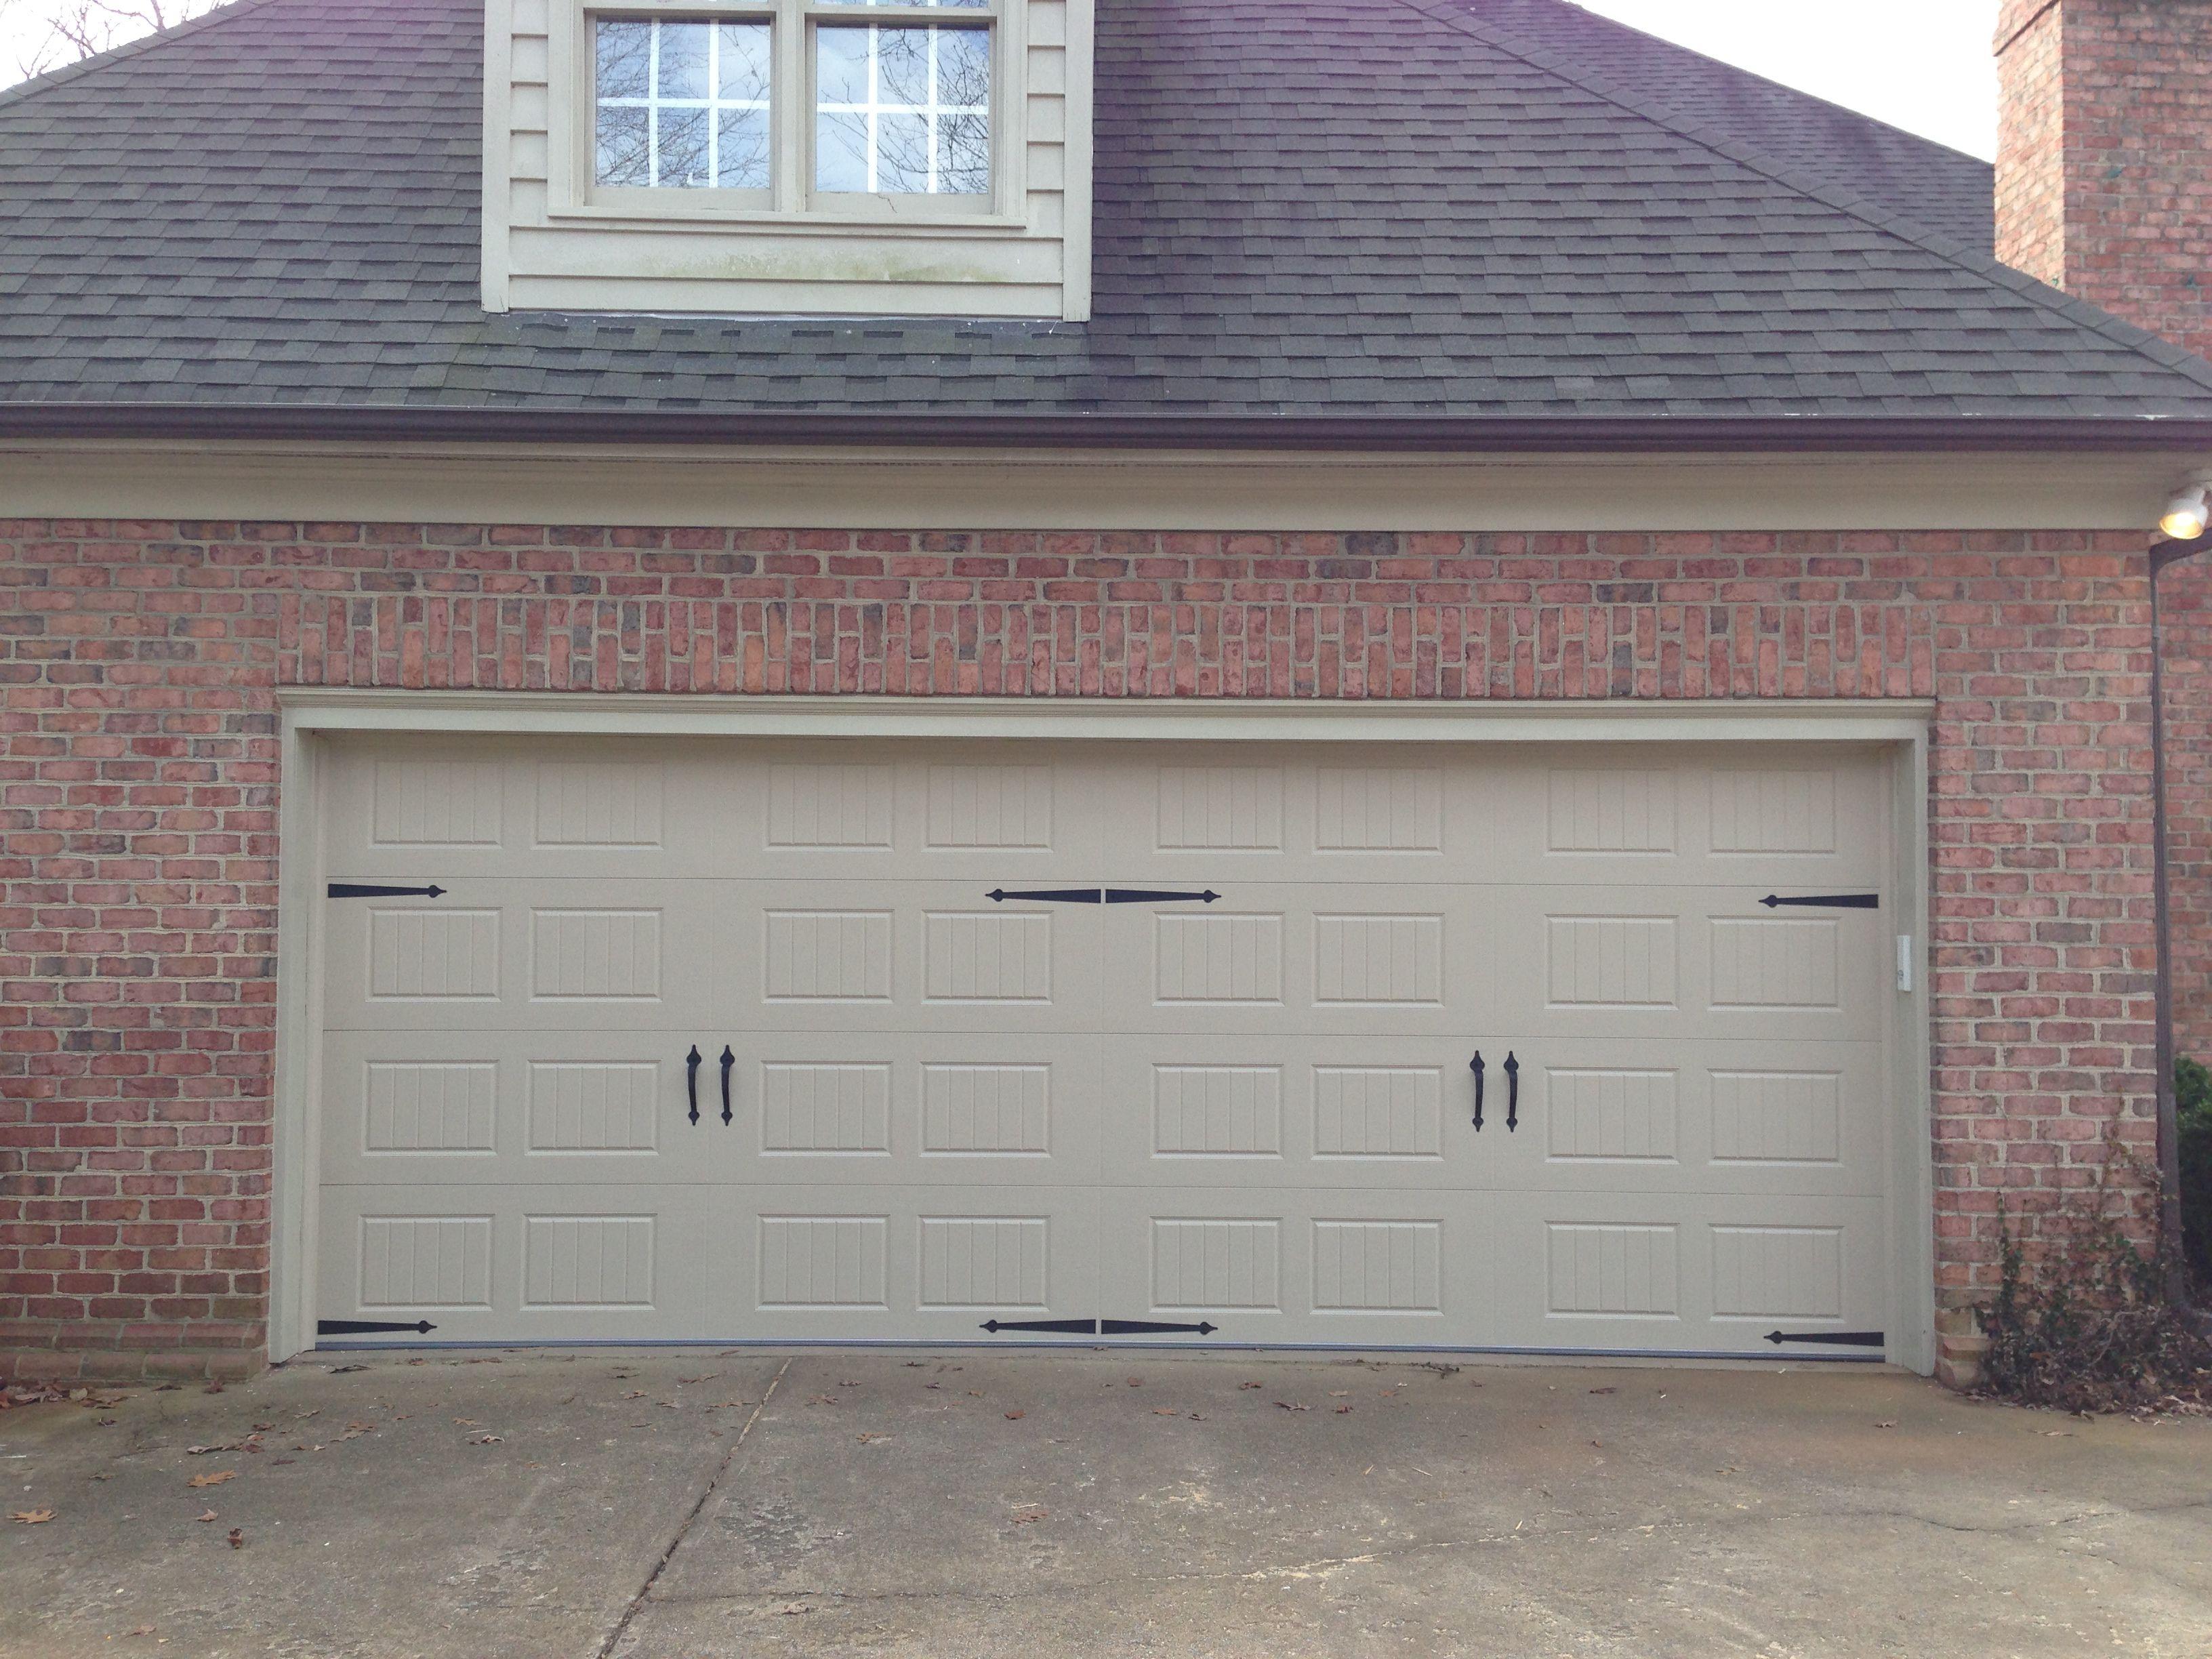 Garage doors carriage house garage doors carriage style garage doors - Our Garage Door Style But Ours Won T Have The Hardware On It Garage Door Styles Carriage House